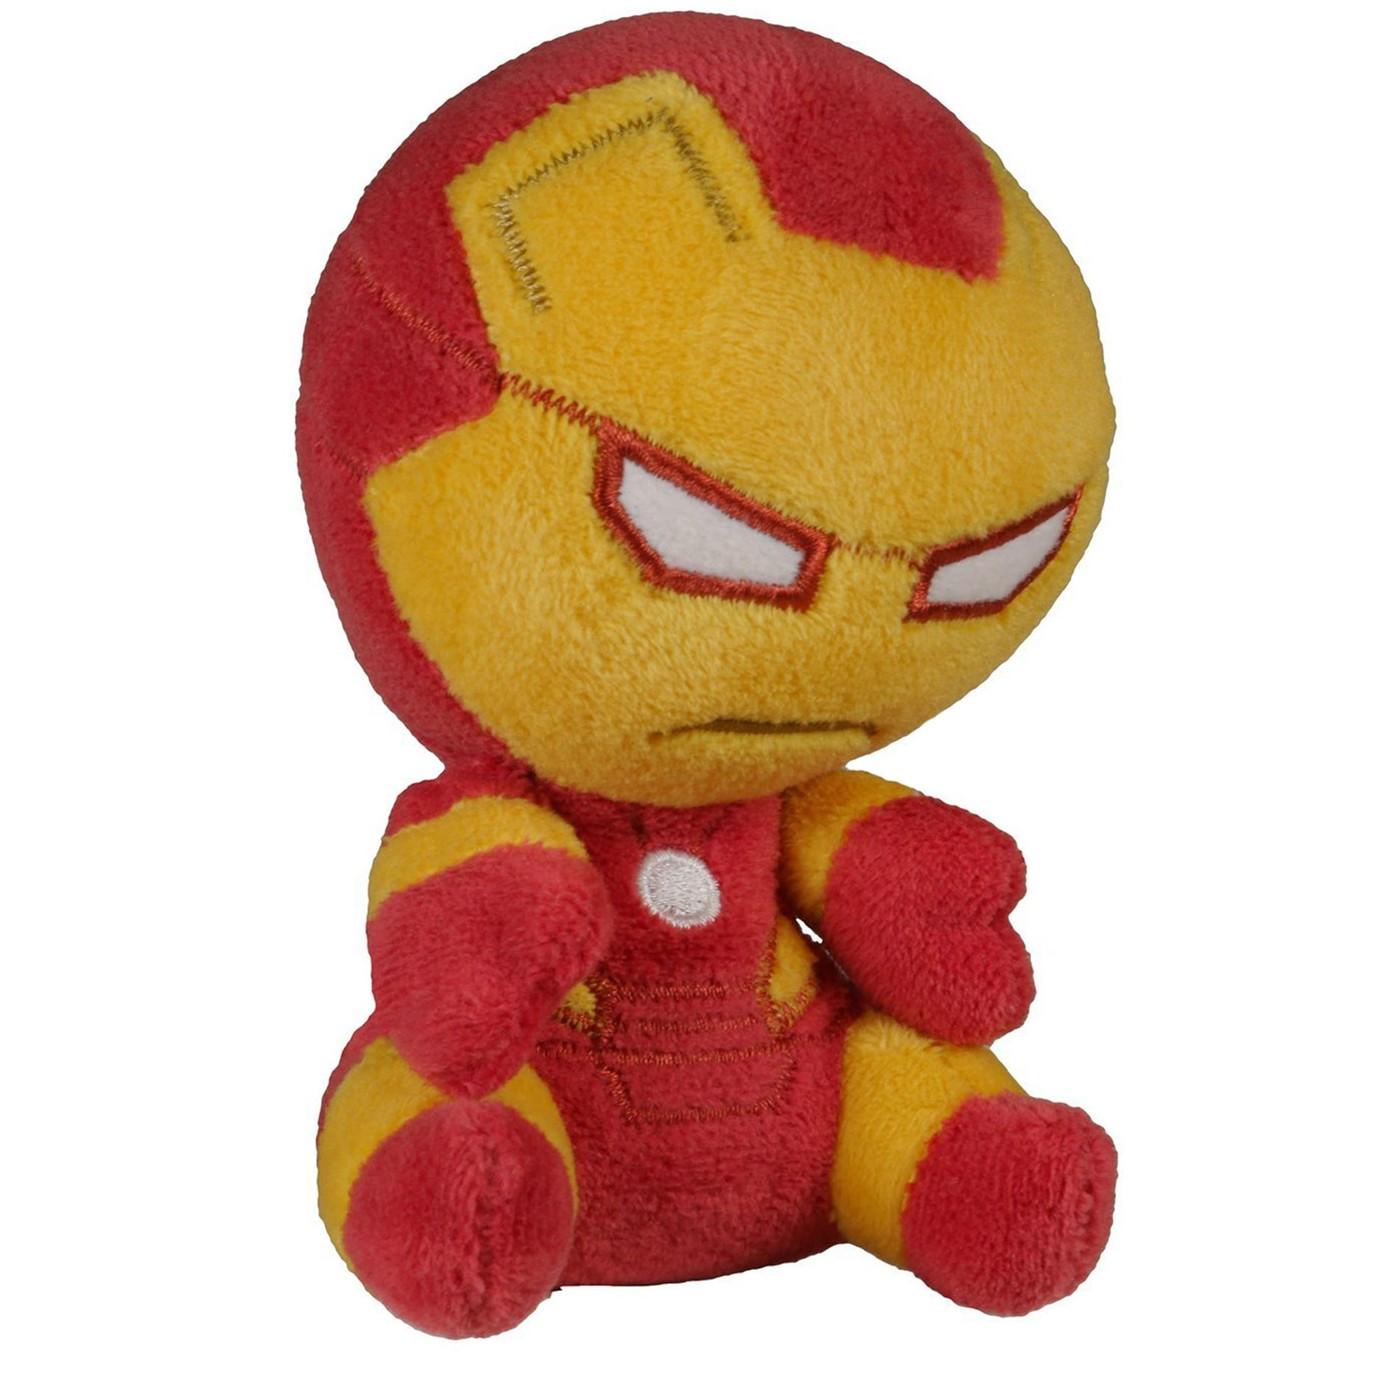 Iron Man Mopeez Plush Figure